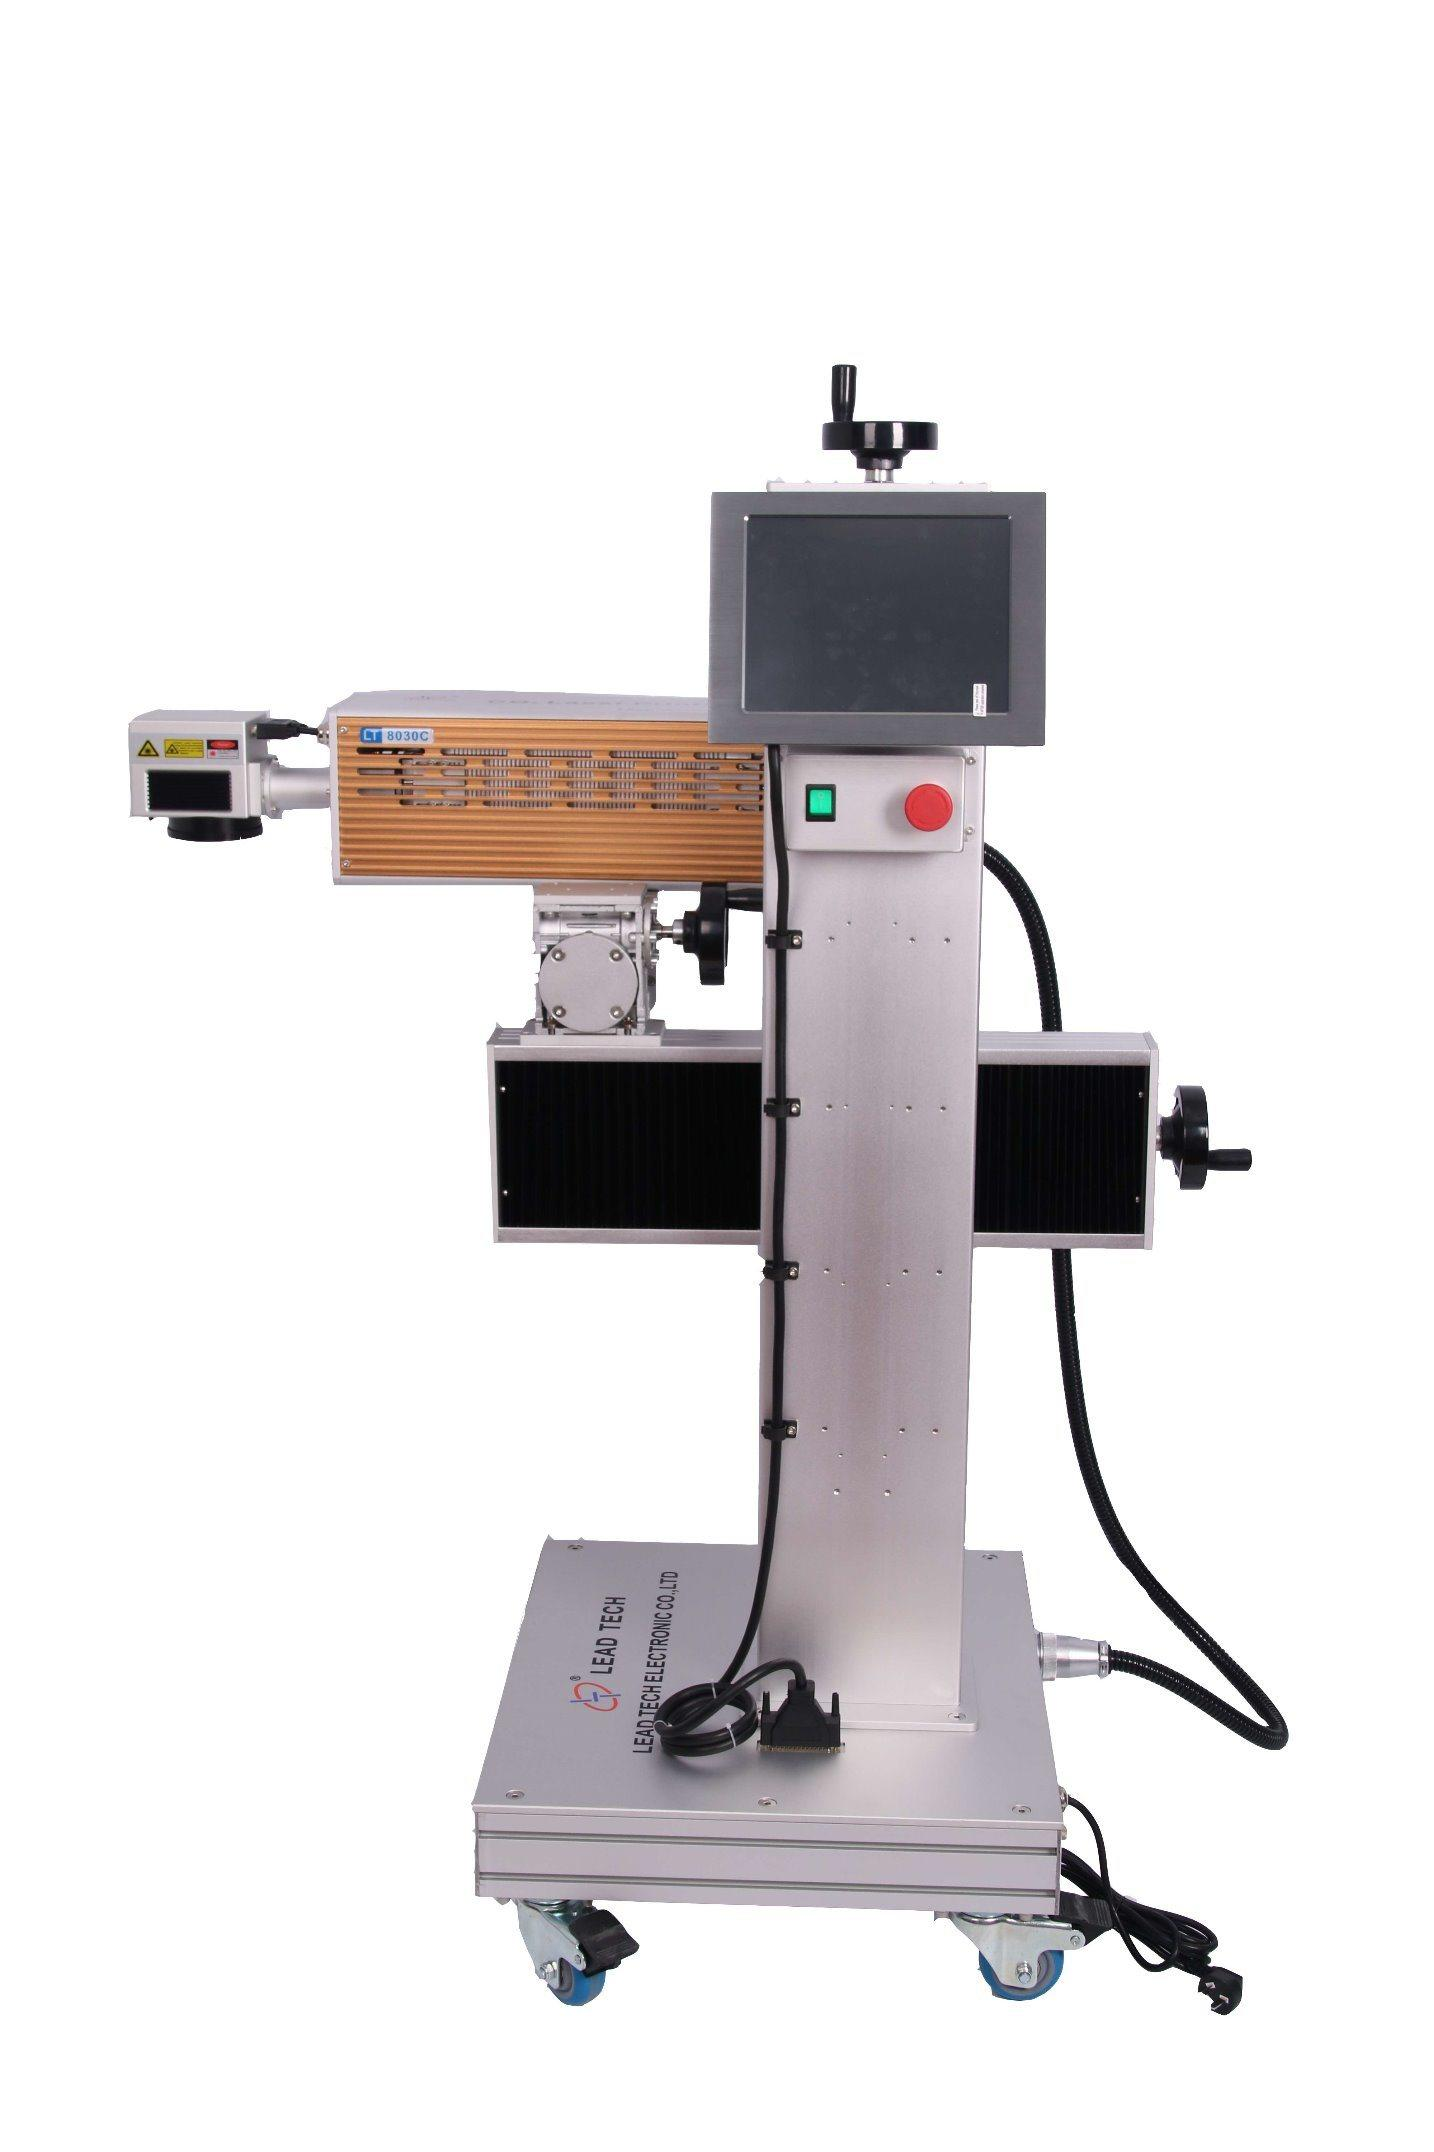 Lt8020c/Lt8030c CO2 High Speed Digital Fly Laser Printer for PPR/PE/PVC Pipe Marking